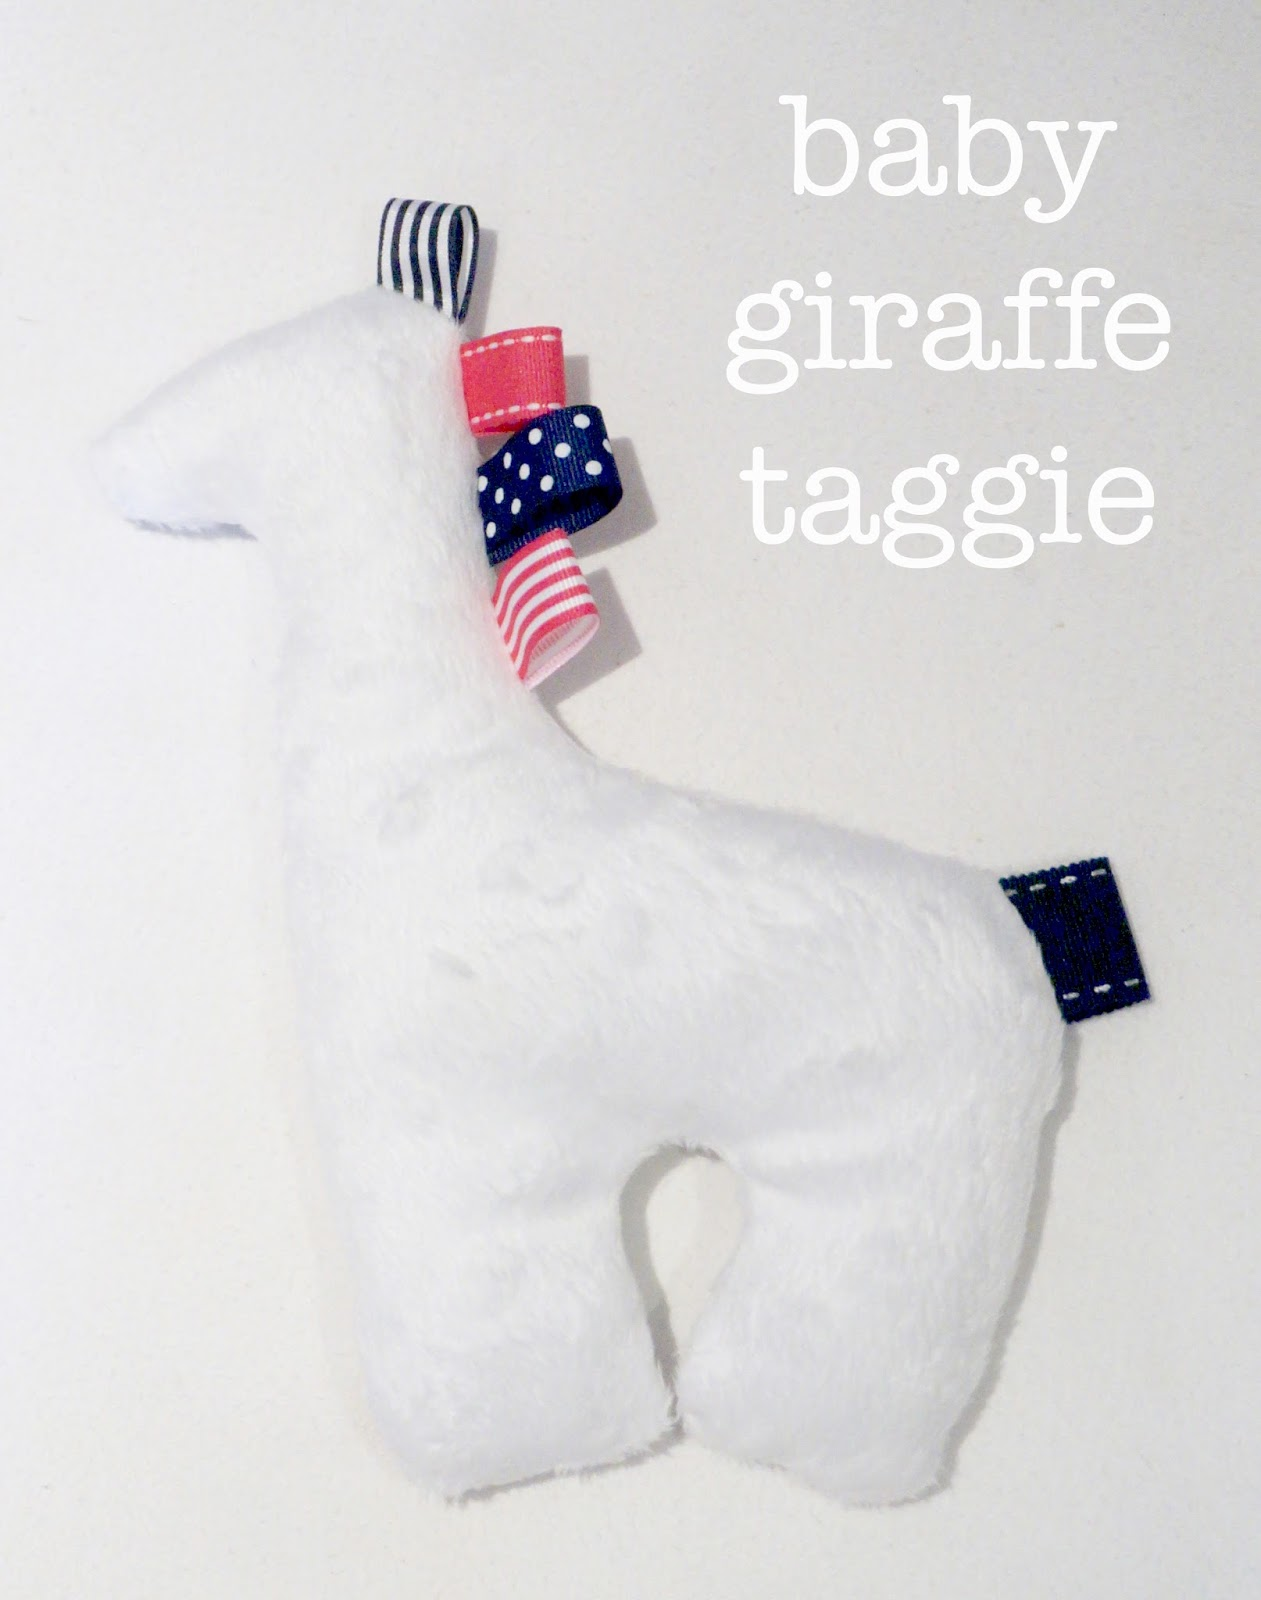 meg-made baby taggie giraffe